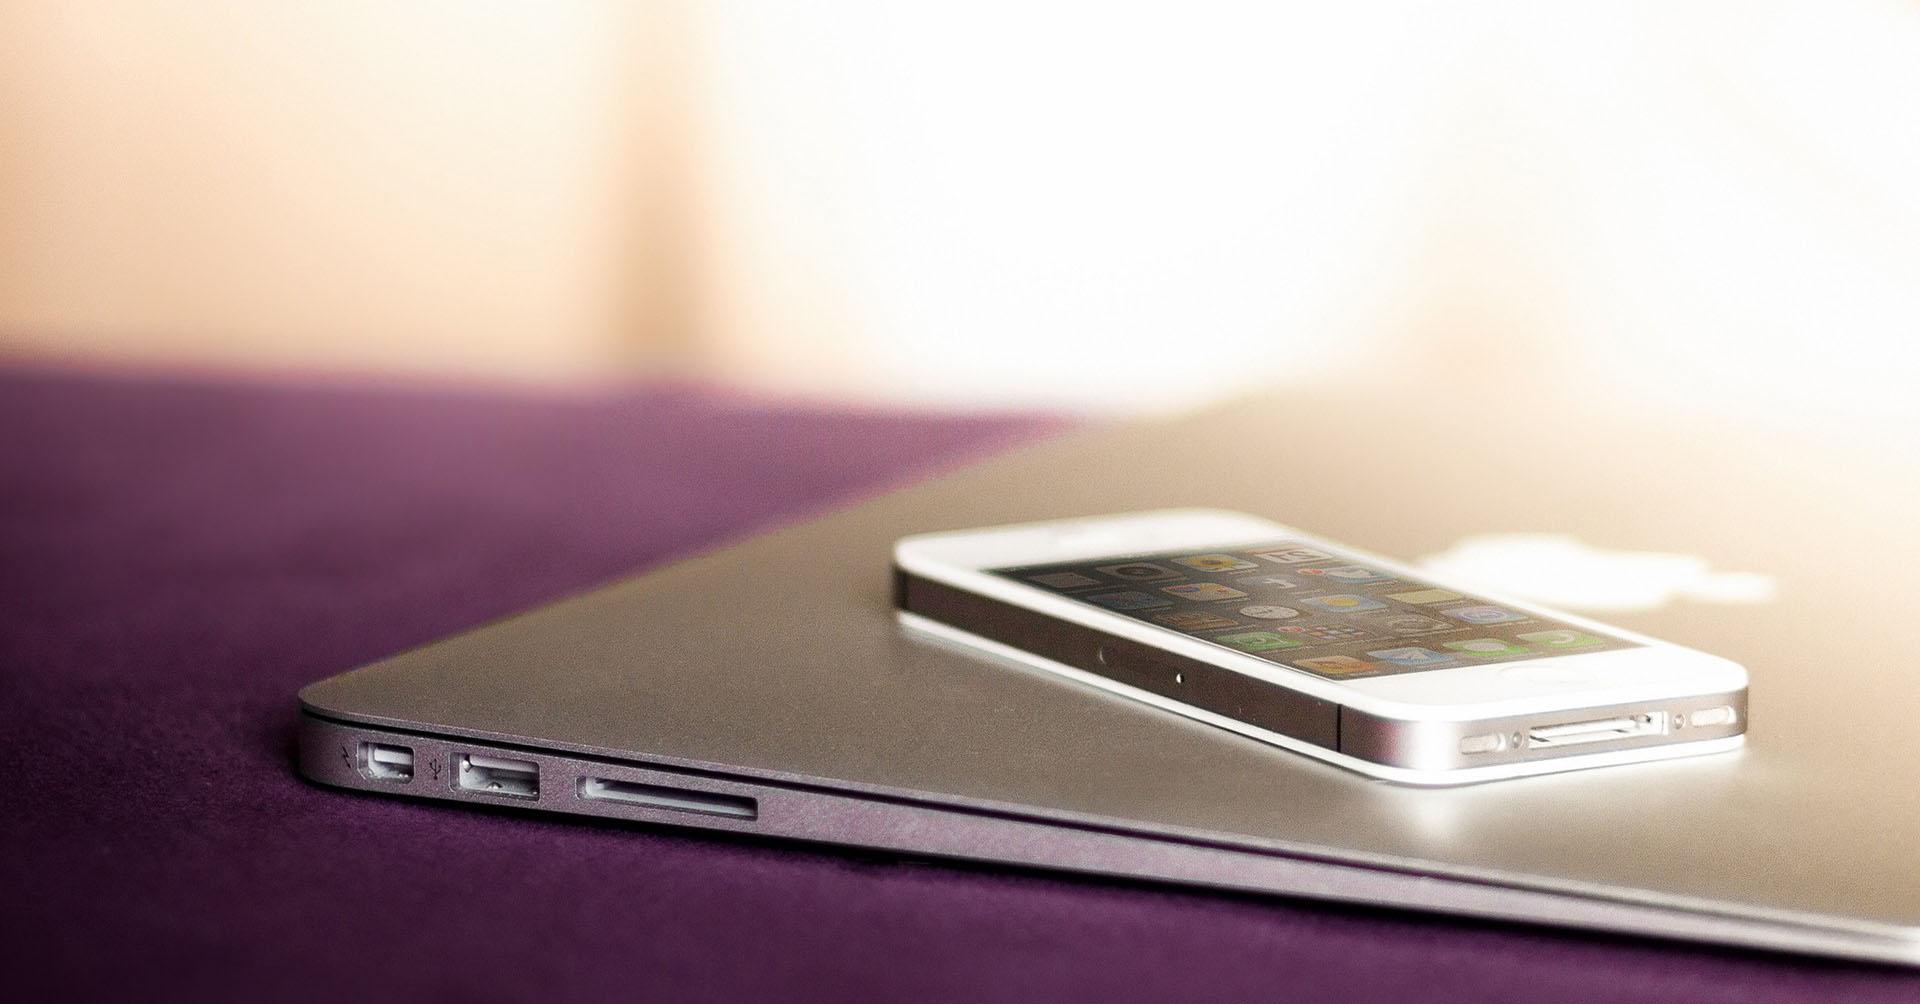 Wallpaper Technology Smartphone Electronics Sketch Up Gadget